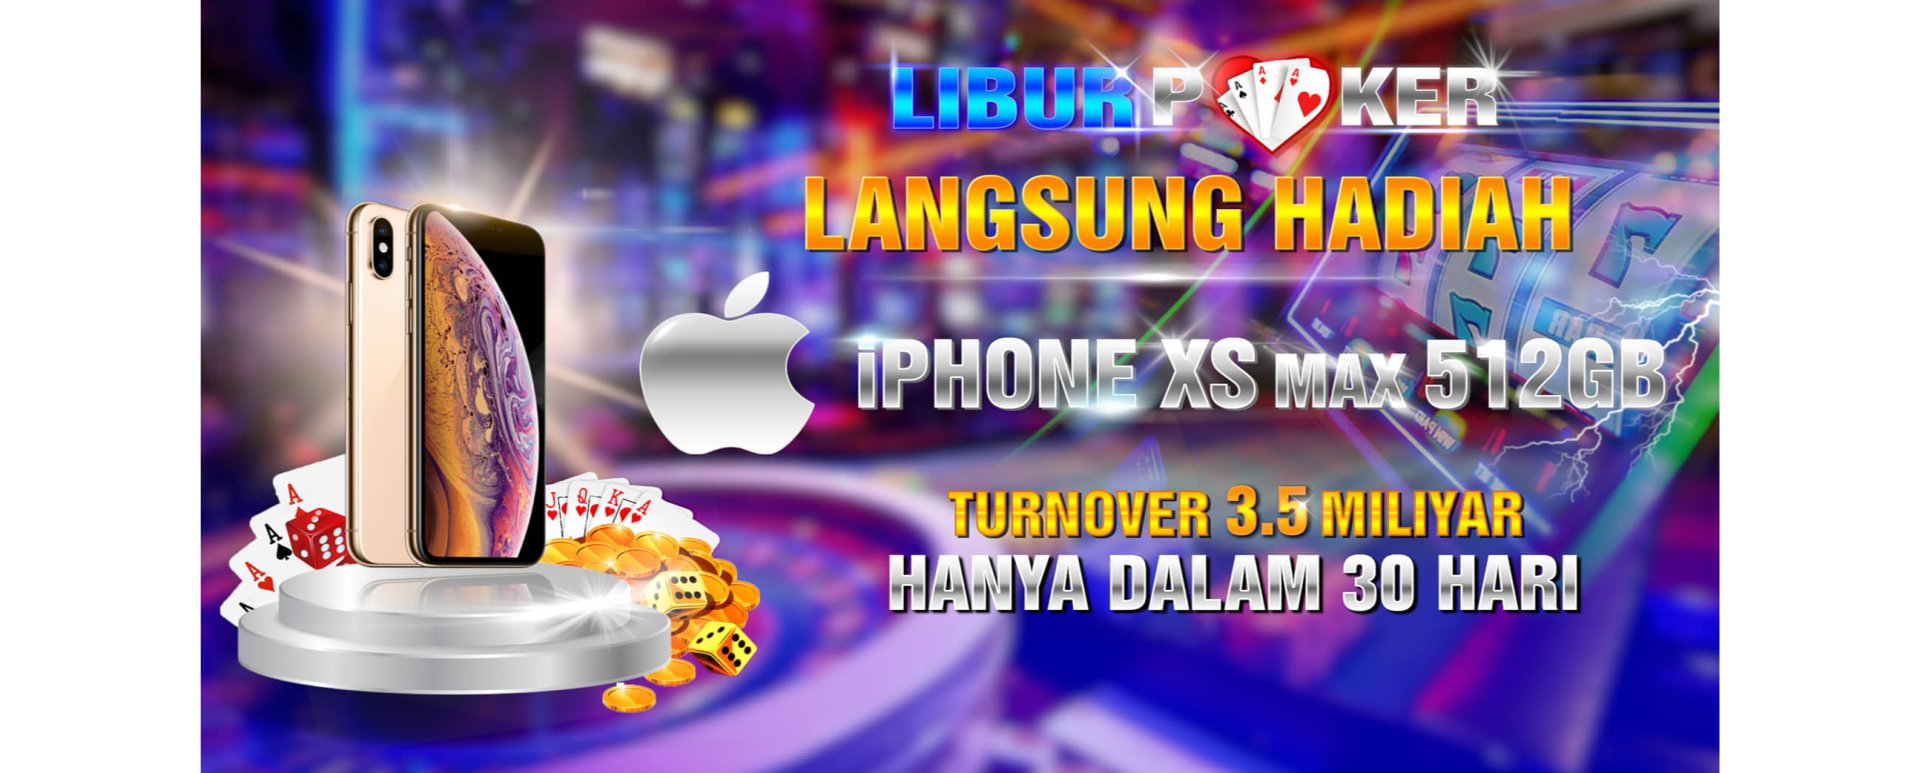 Libur Poker88 Asia Dewa Poker Online Terpercaya Di Indonesia Liburpoker S Portfolio